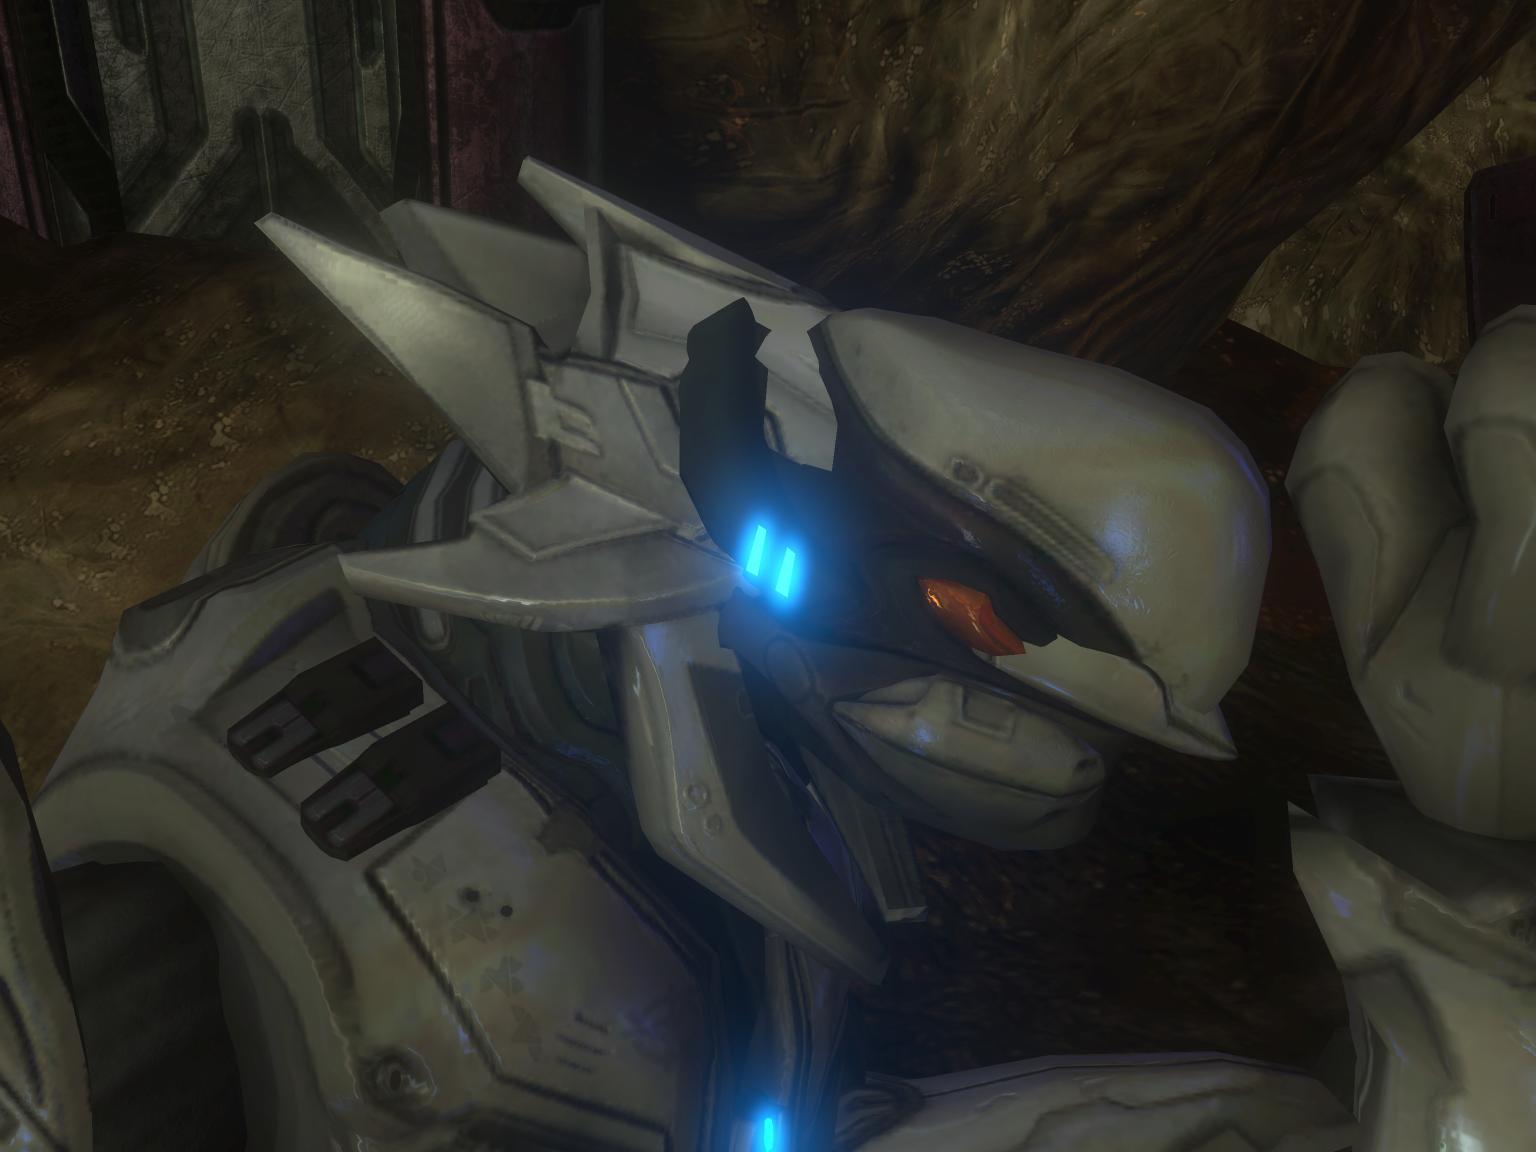 Halo 3 Elites vs Halo 4 Elites Halo 2 Halo 3 Halo 4